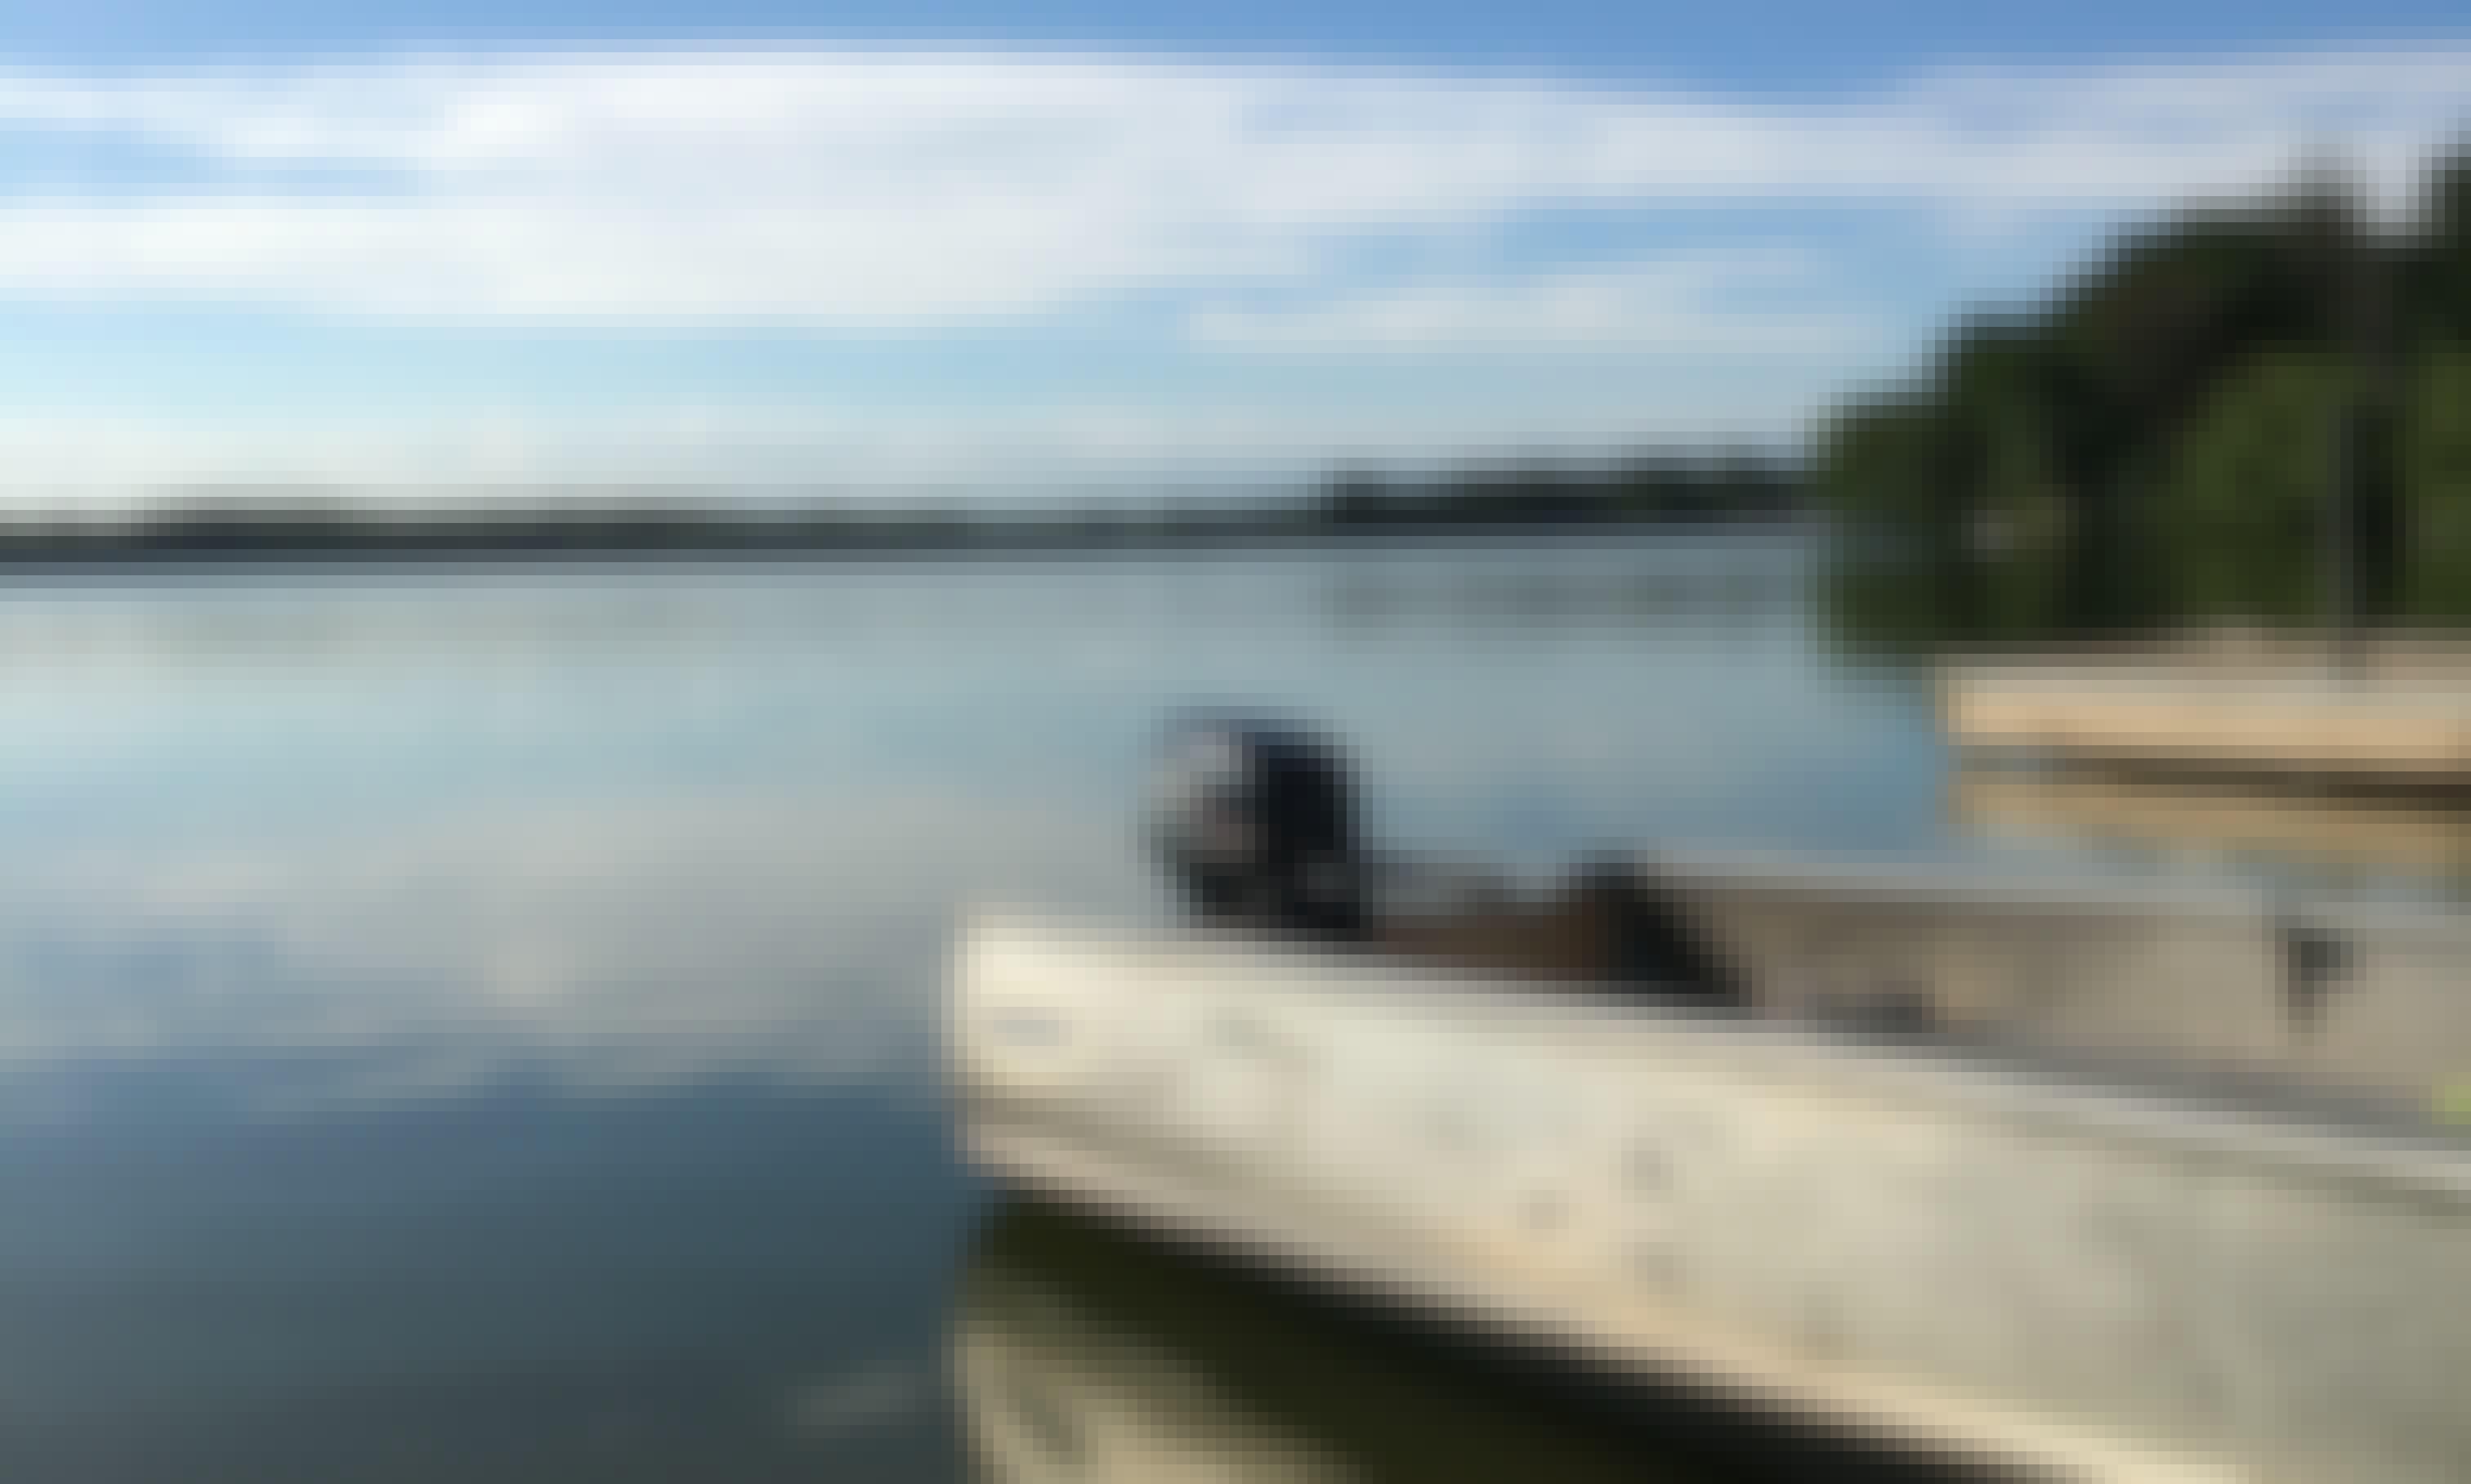 Fishing Boat Rental On Crooked Lake, Coon Rapids